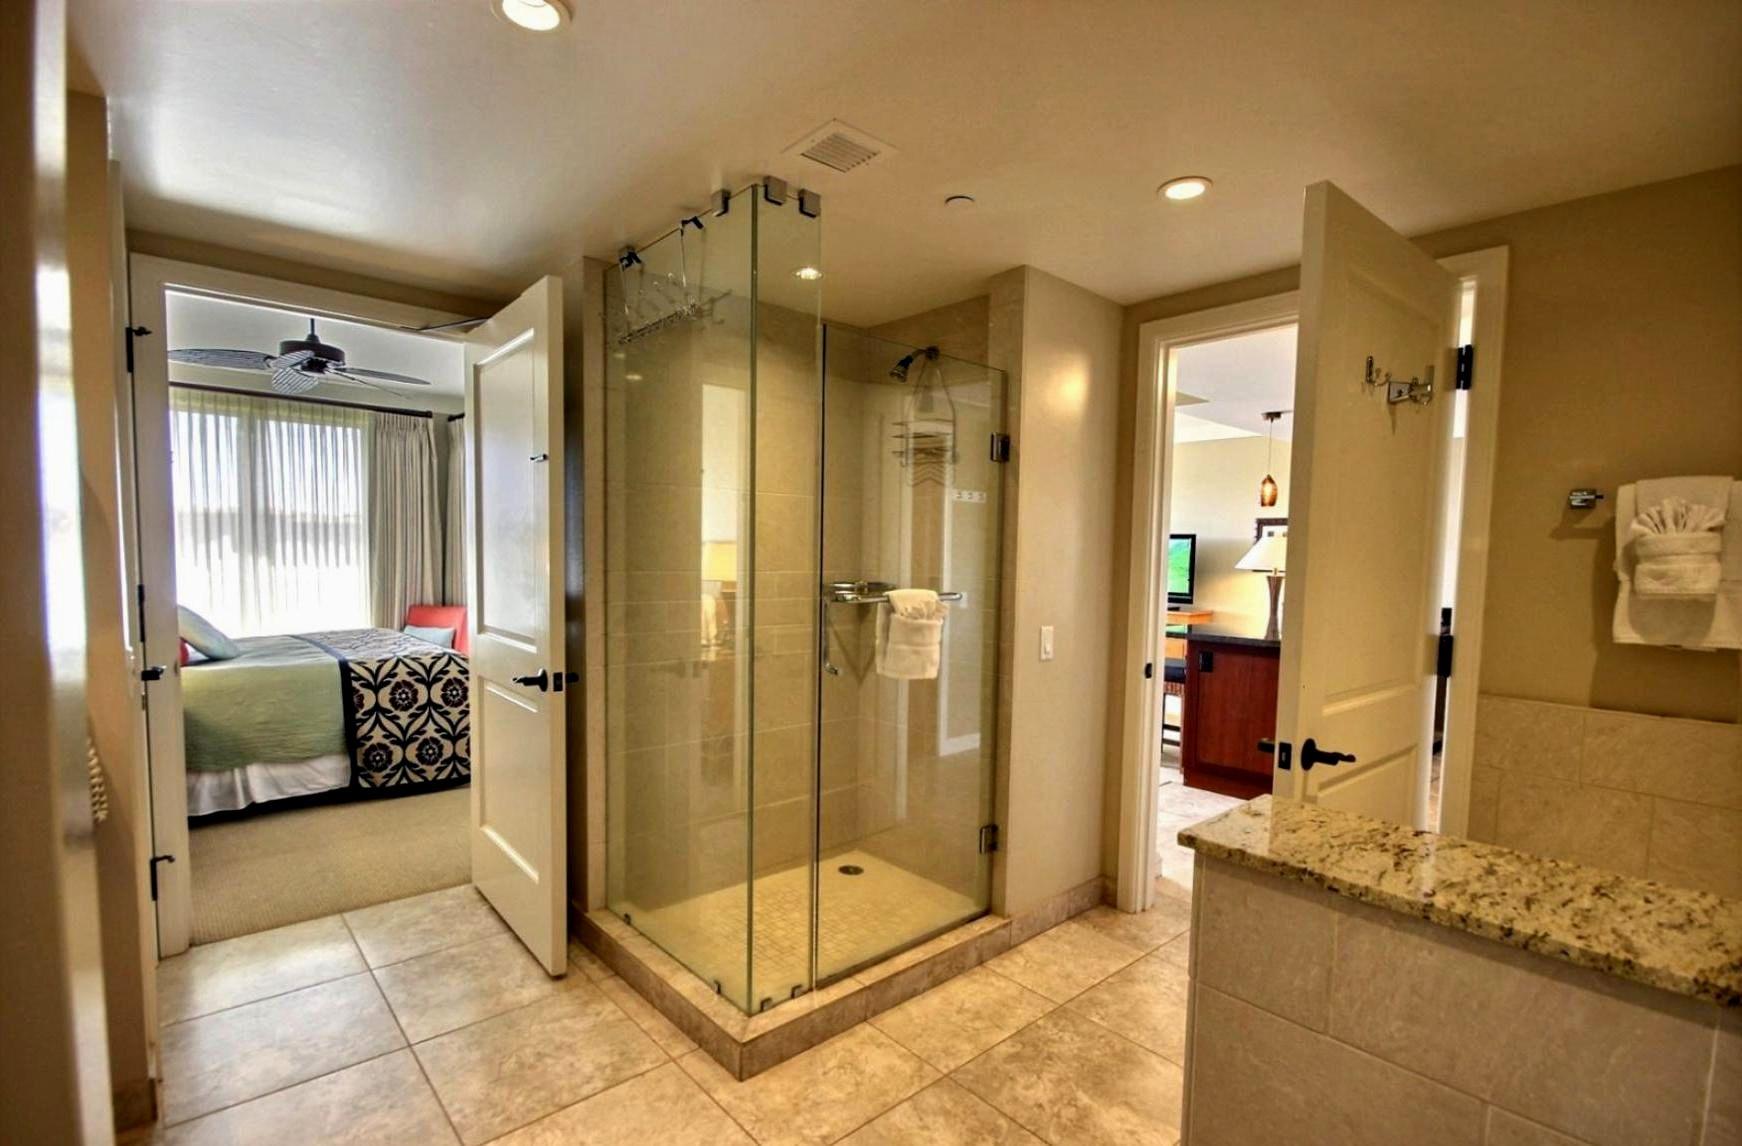 fascinating jack and jill bathroom concept-Amazing Jack and Jill Bathroom Online